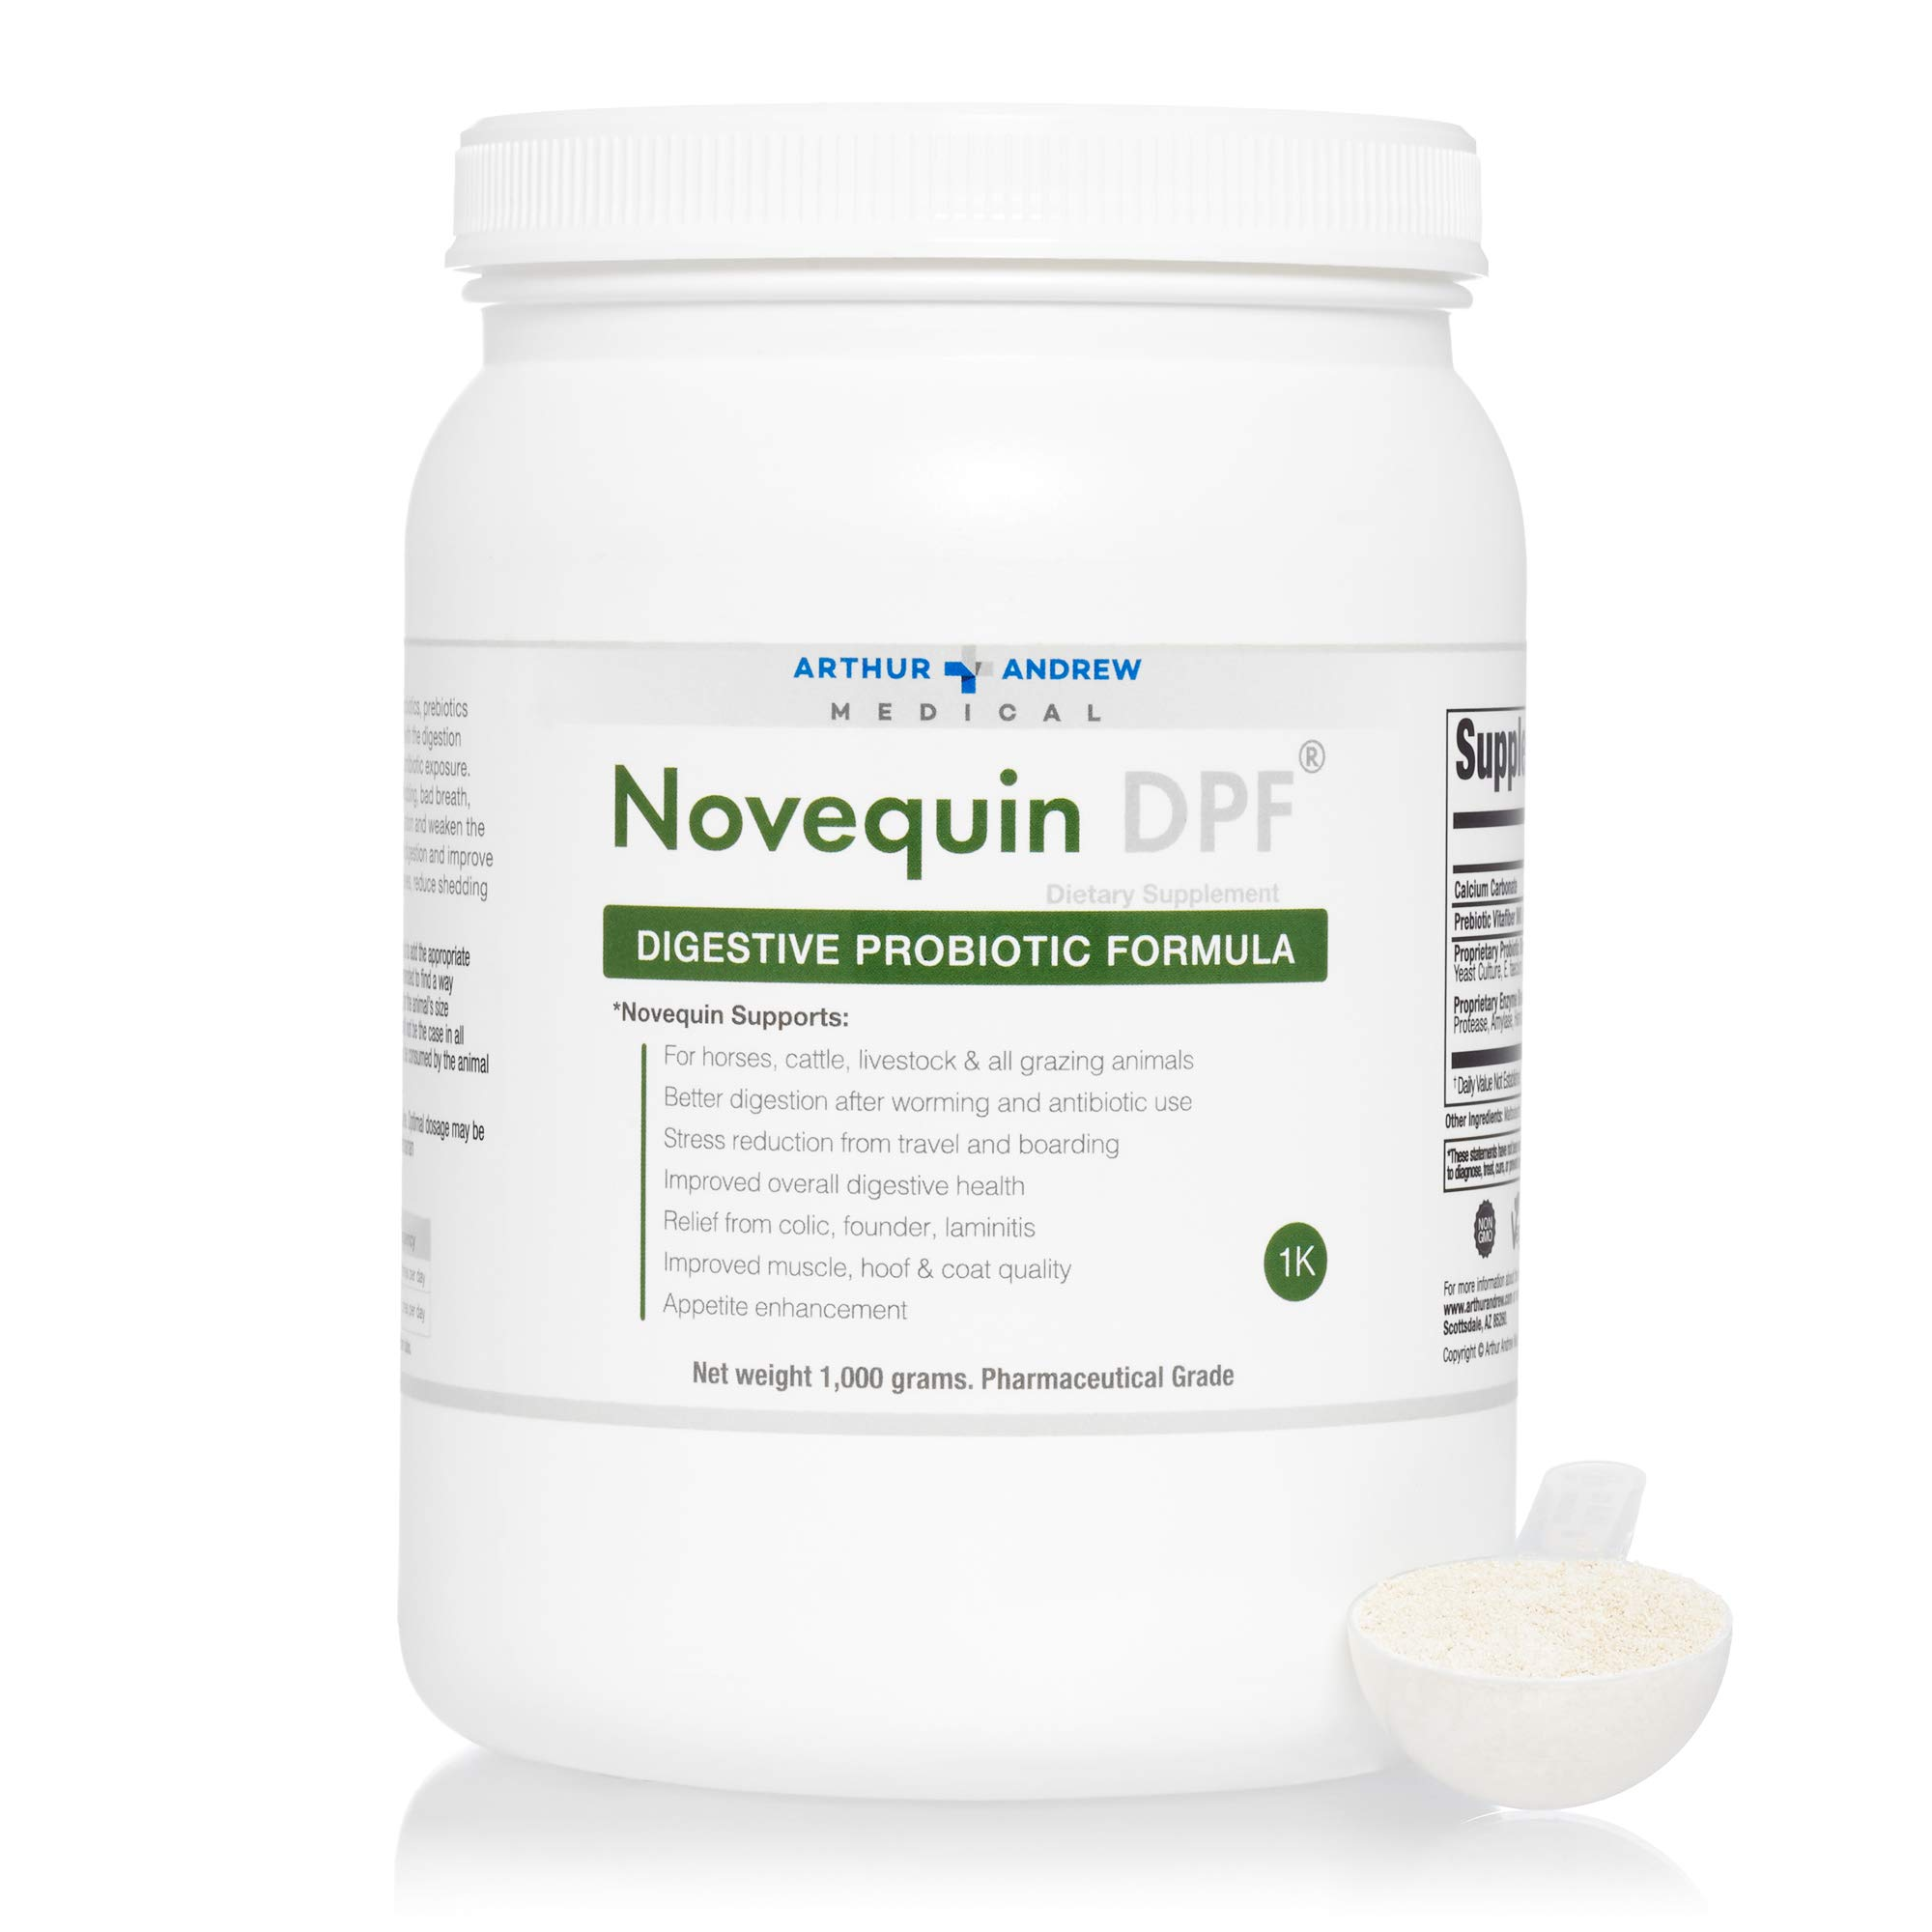 Arthur Andrew Medical - Novequin DPF, Digestive Probiotic Formula for Large Animals, Prebiotics, Probiotics, and Enzymes, Non-GMO, 1000 Grams